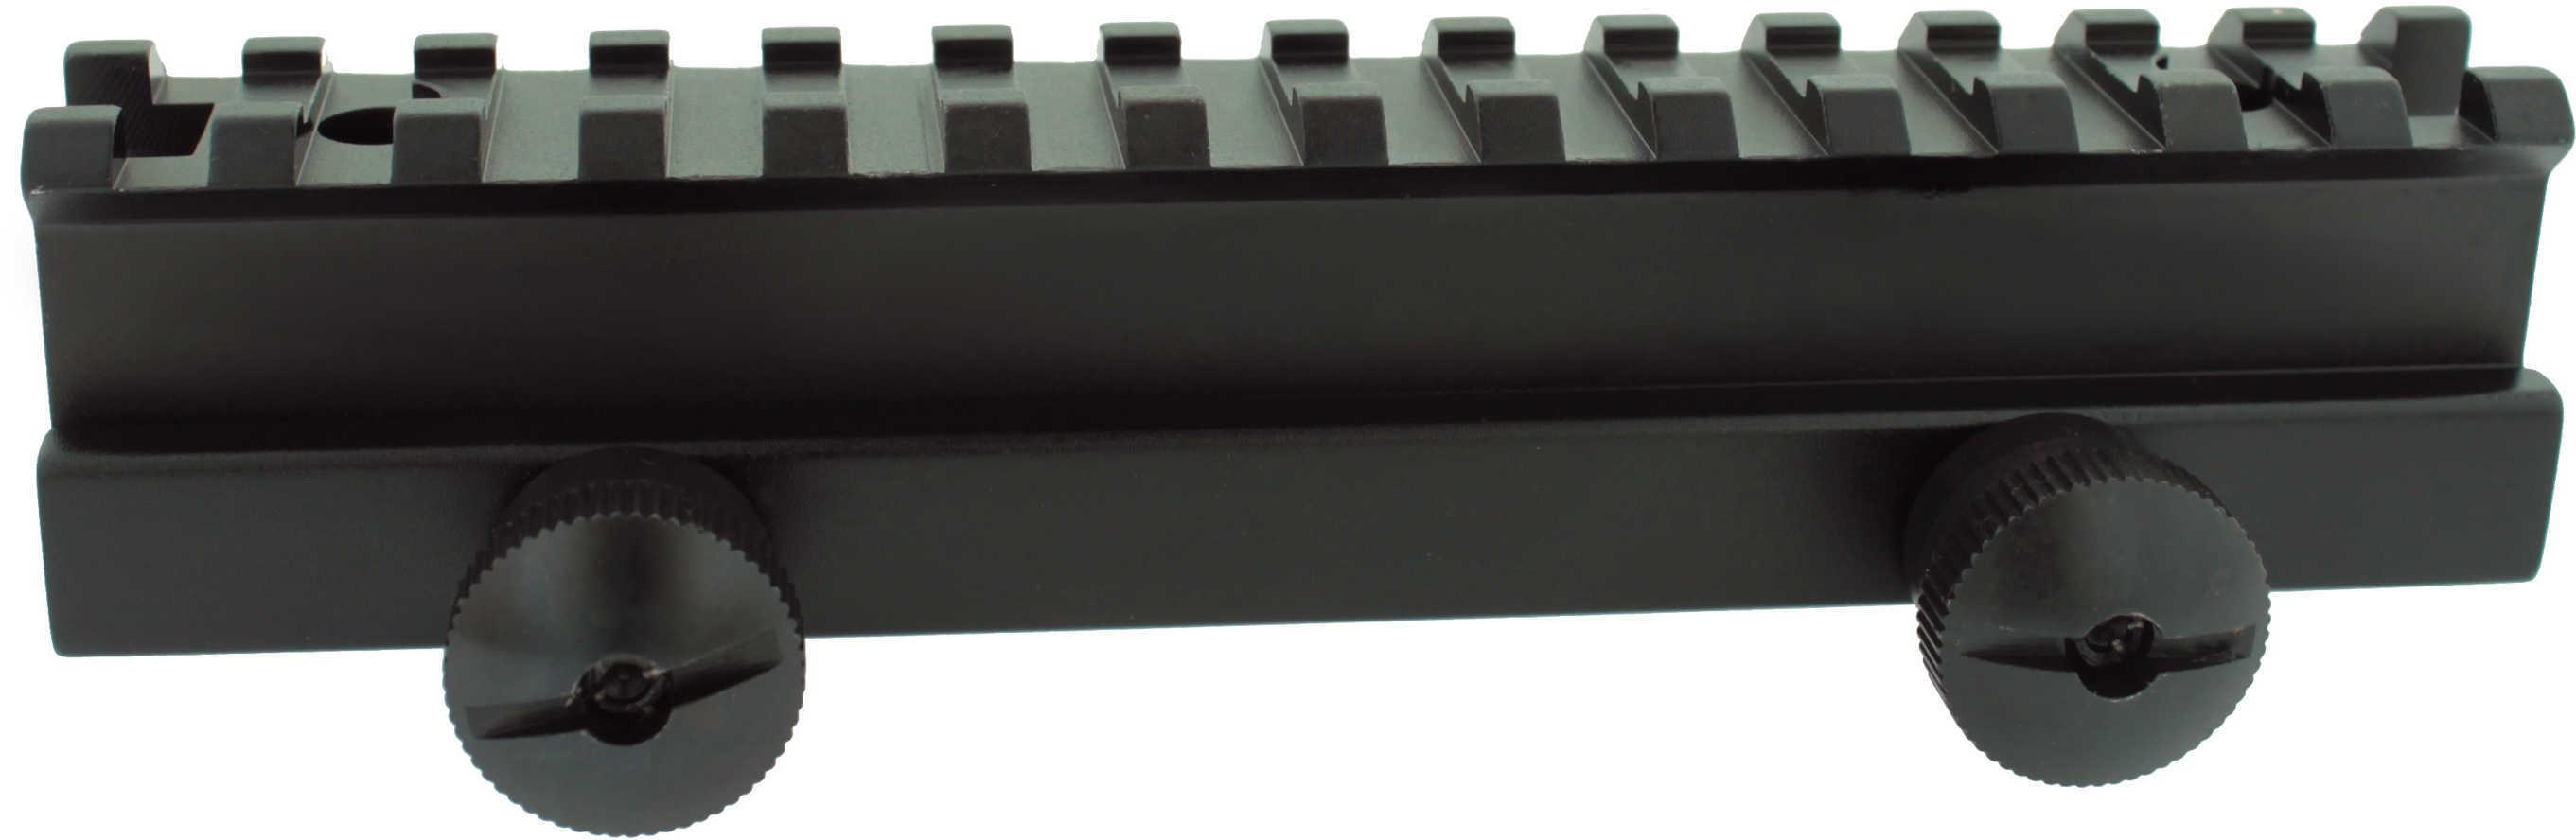 Weaver AR-15 Single Rail Flat Top, Matte Black Md: 48321